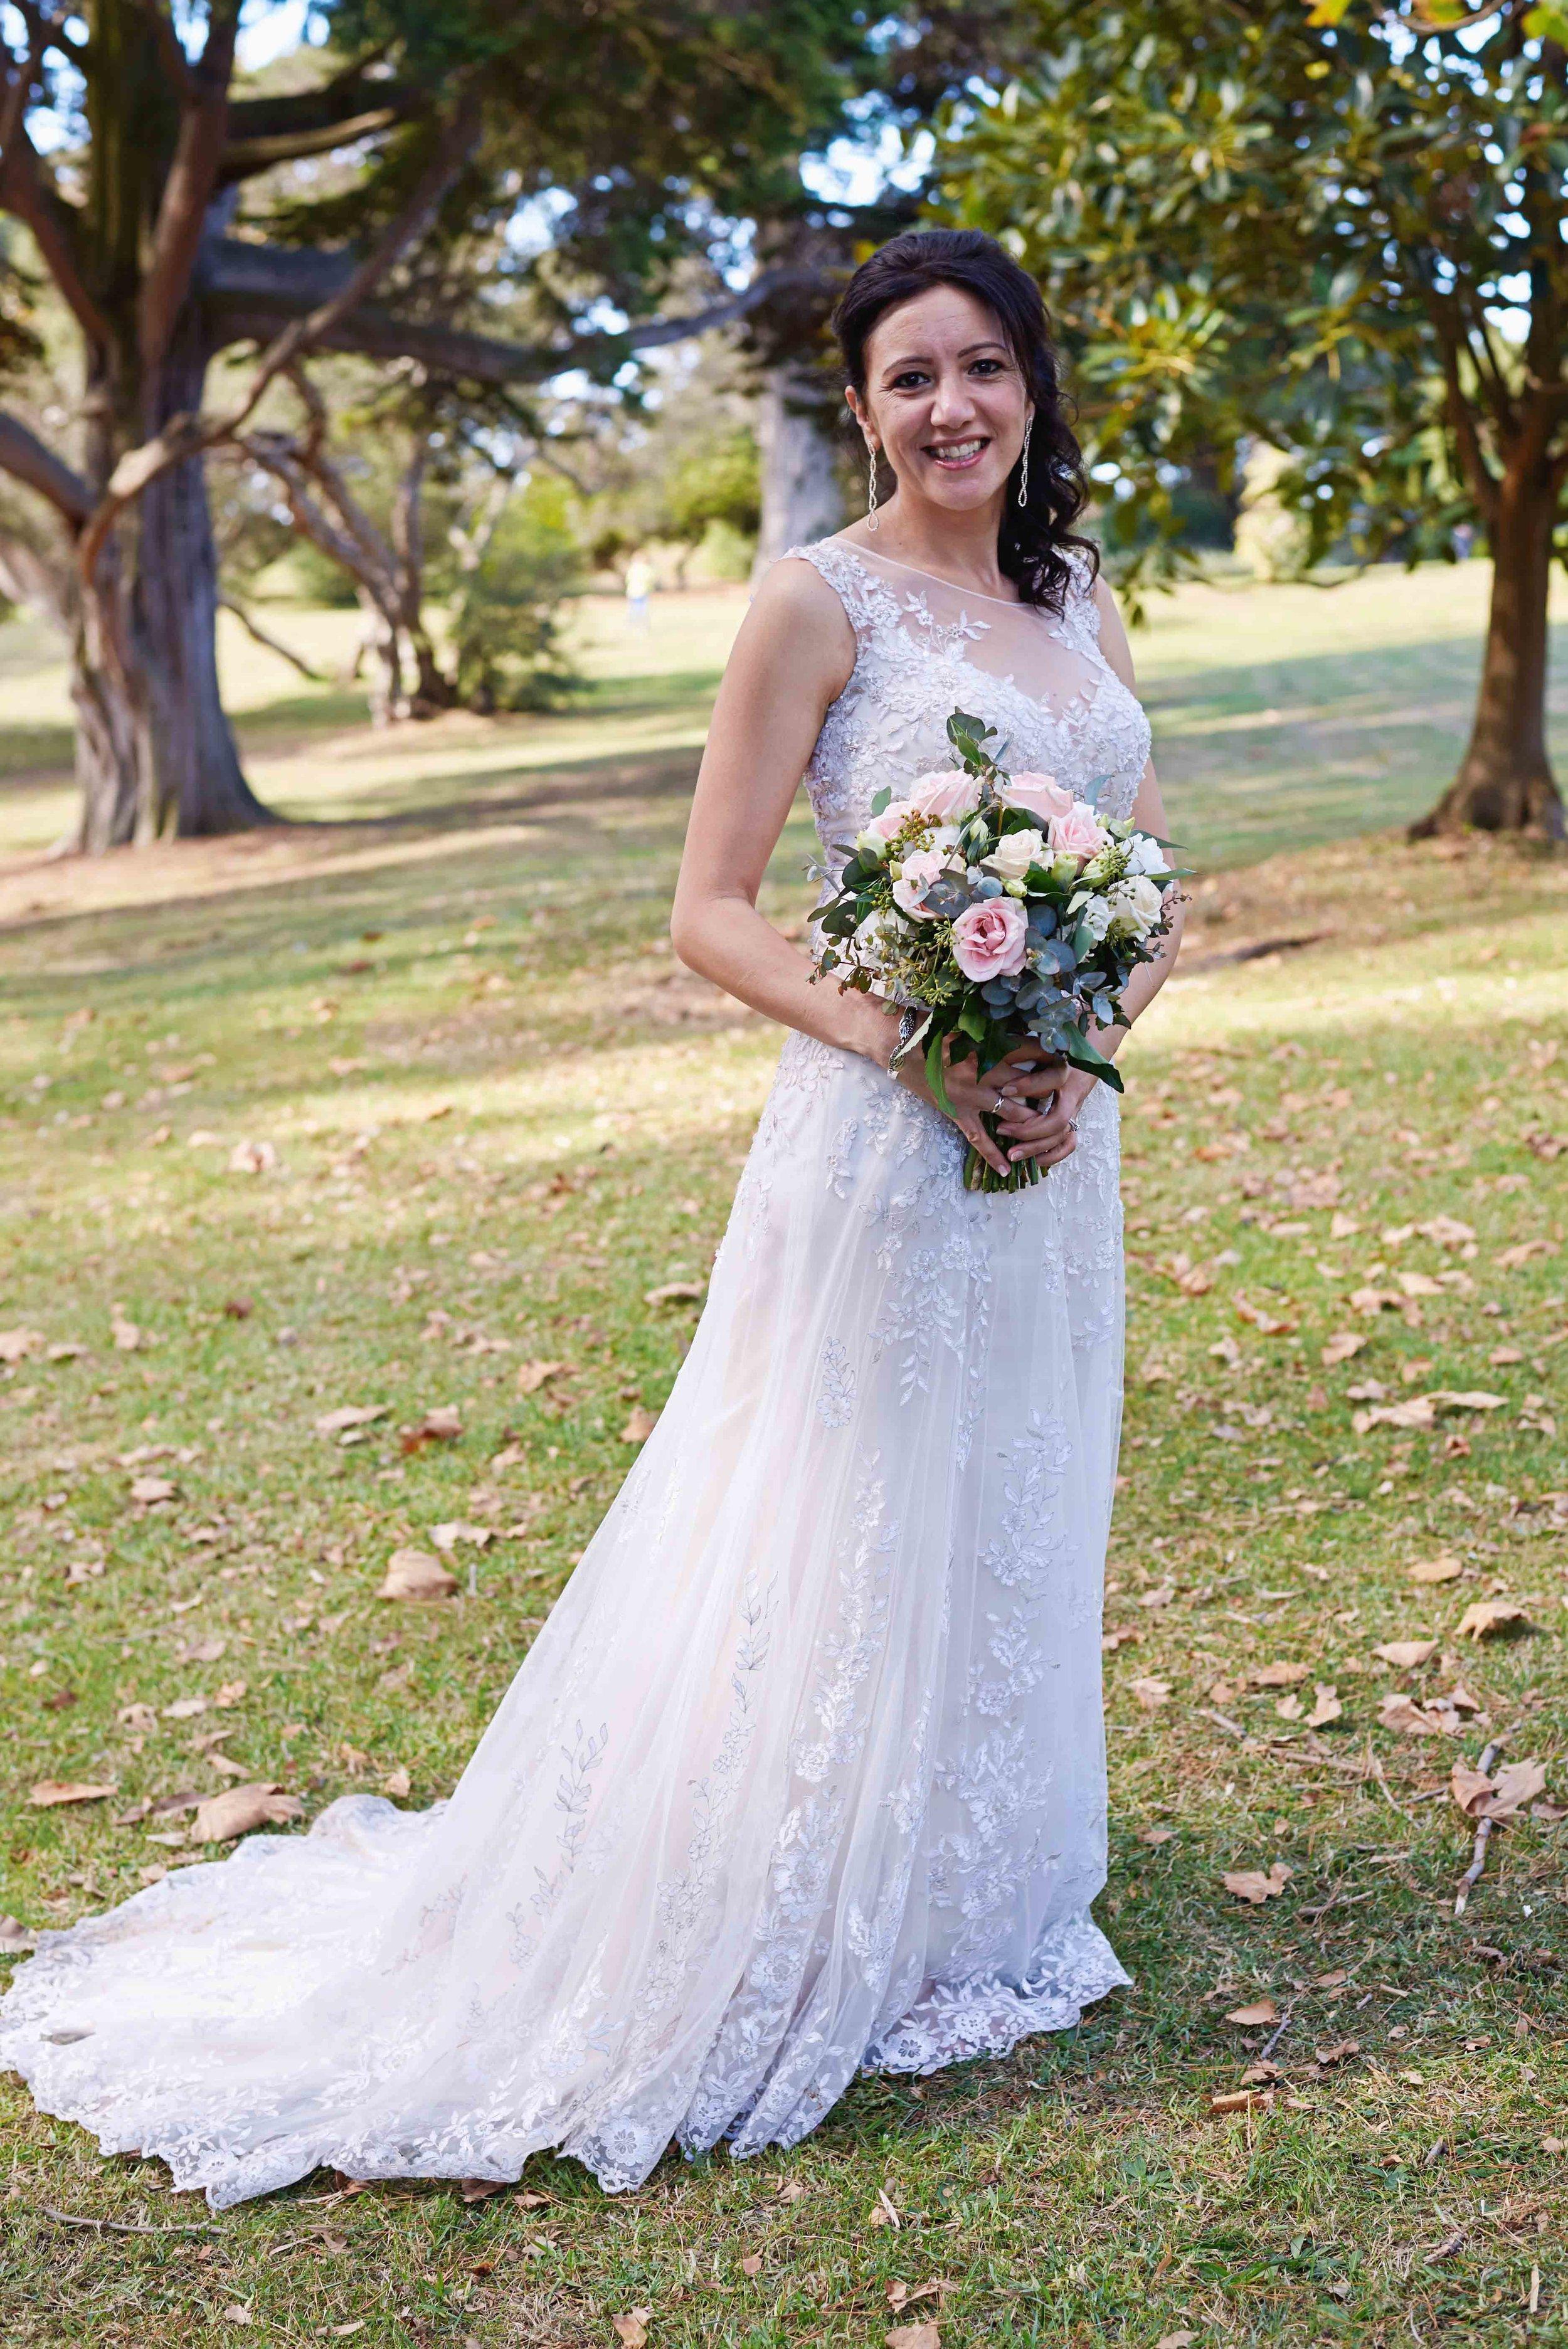 sorrento-wedding-photography-all-smiles-marissa-jade-photography-135.jpg